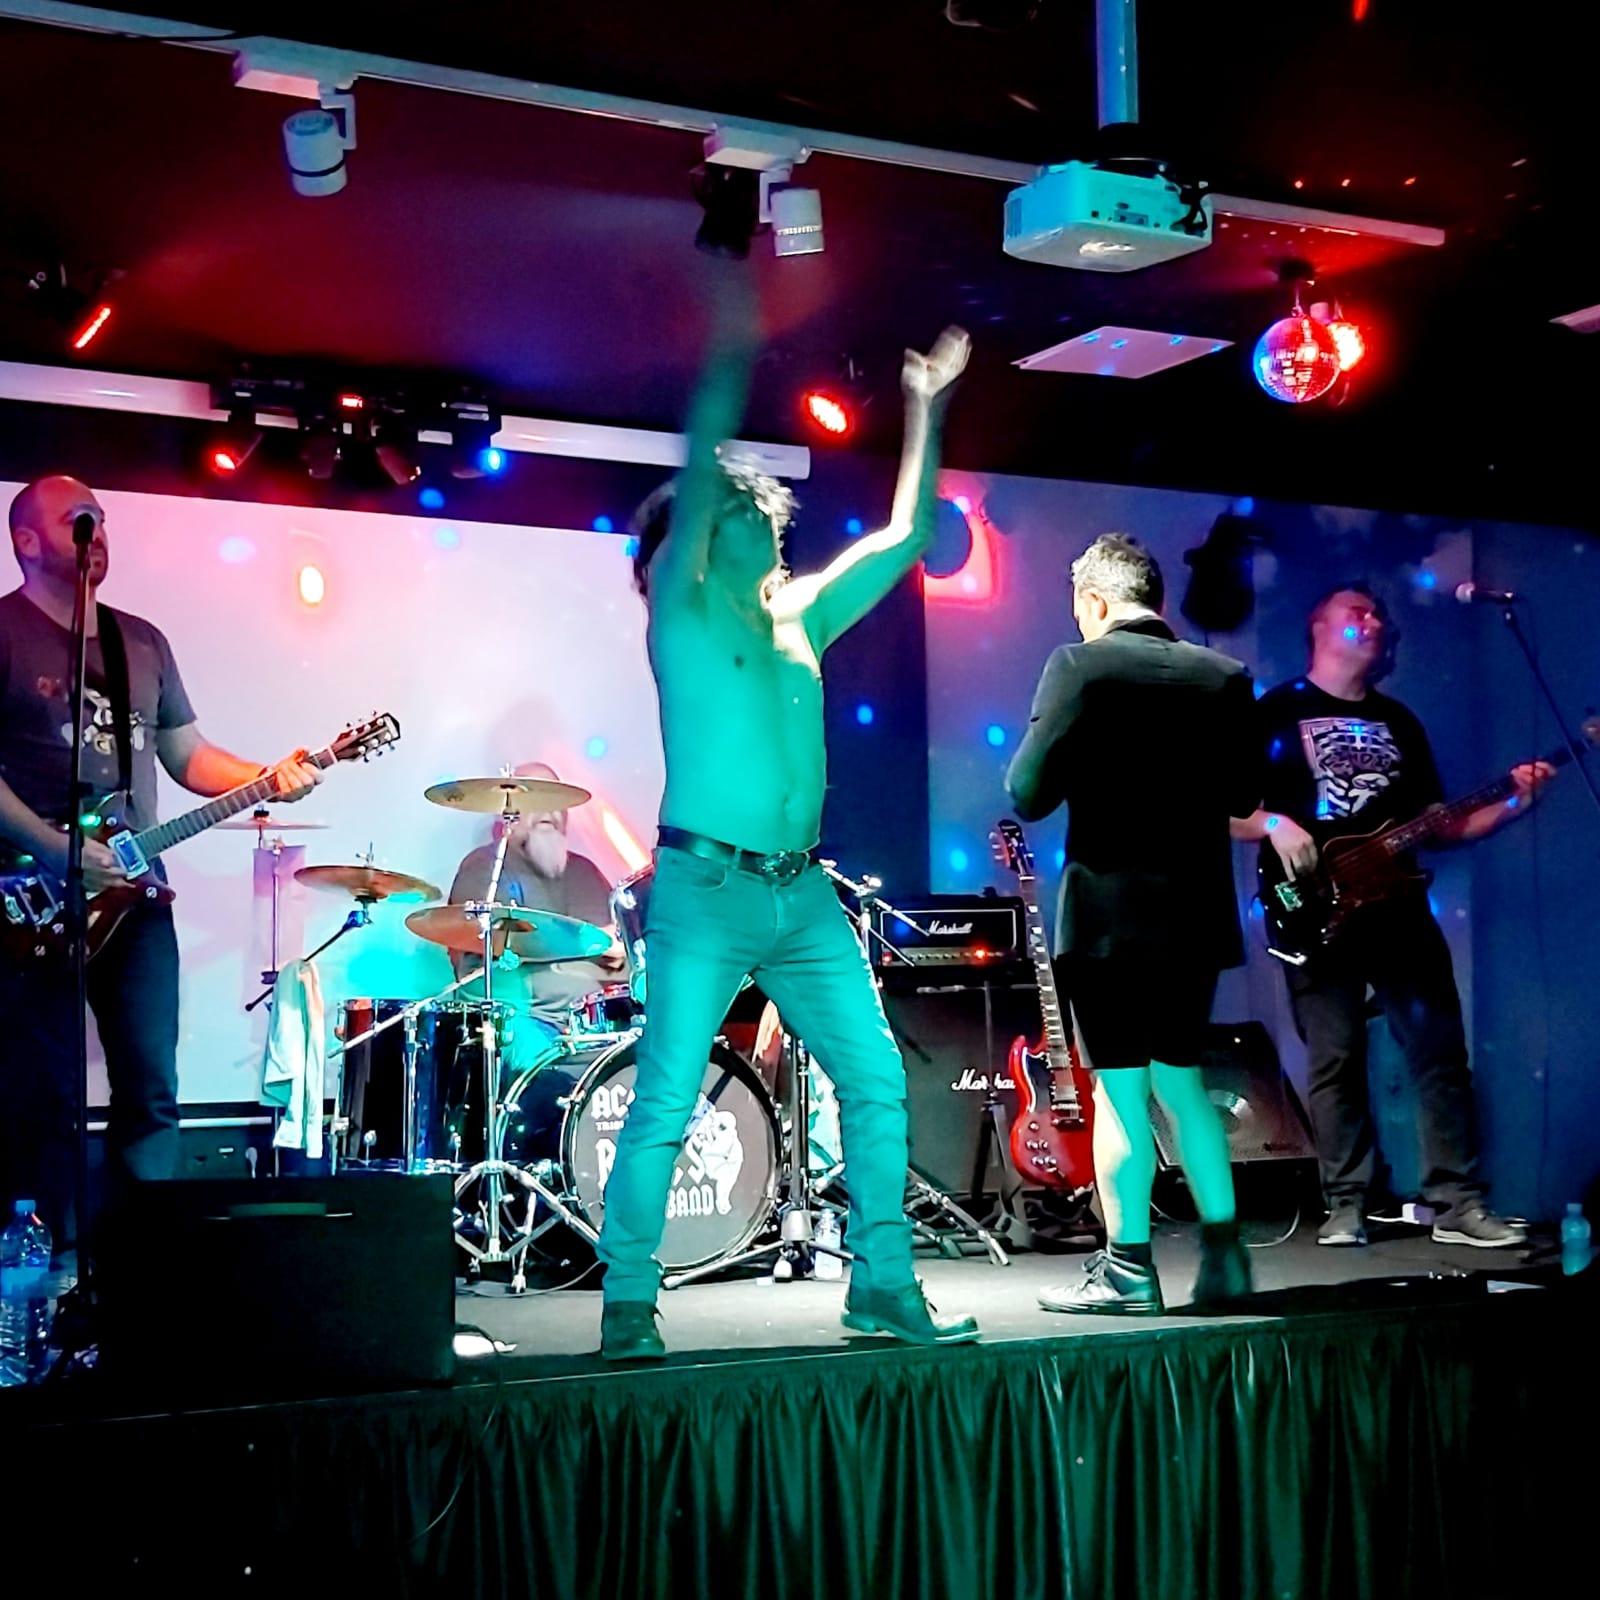 Energy Club Andorra ACDC tribut grup ROSIE'S música en viu copes, còctels, bolera, karaoke i festes. Amb ROSIE'S tornarem a l'època dels 70/80 #acdc #rock #rocknroll #gunsnroses #hardrock #angusyoung #music #srock #malcolmyoung #guitar #metallica #bonscott #metal #ledzeppelin #cliffwilliams #rockstar #rocker #rockandroll #gibsonsg #axlrose #vocals #legend #billbayley #ironmaiden #axlroseisonfire #brianjohnson #energyclub #energyandorra #andorraenergy